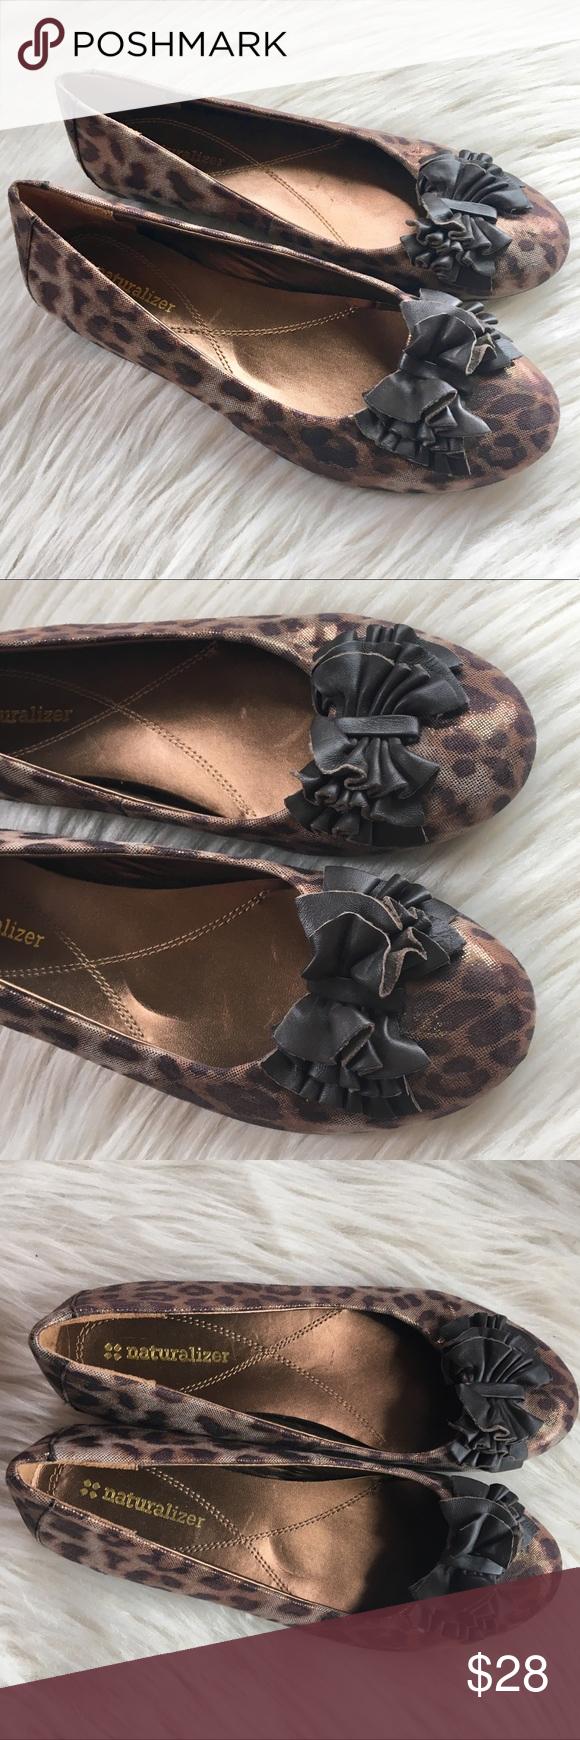 naturalizer leopard flats